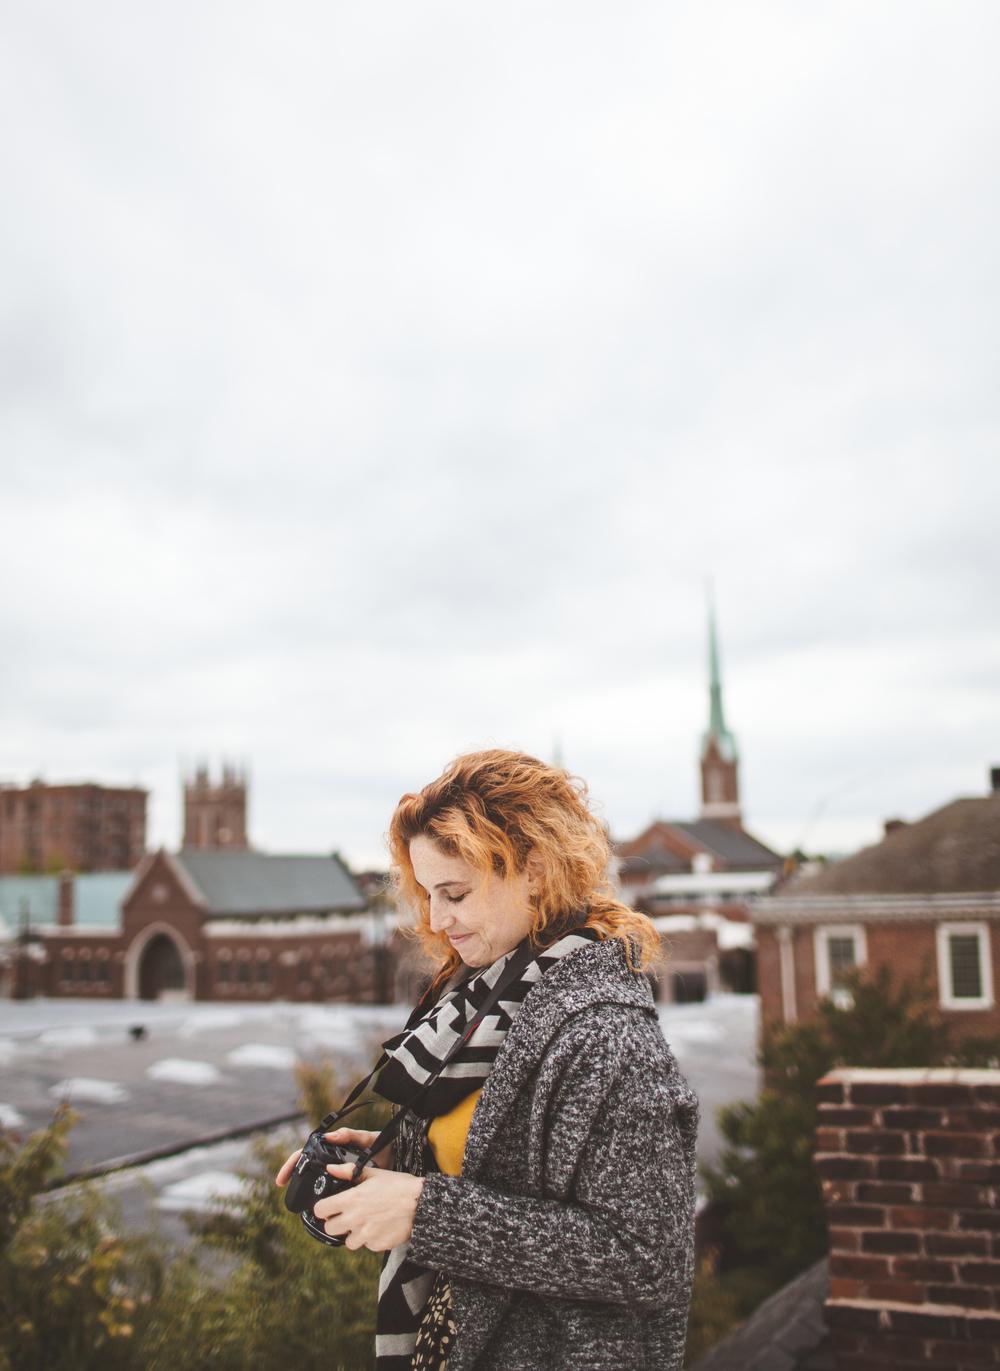 Sarah Rooftop-3.jpg